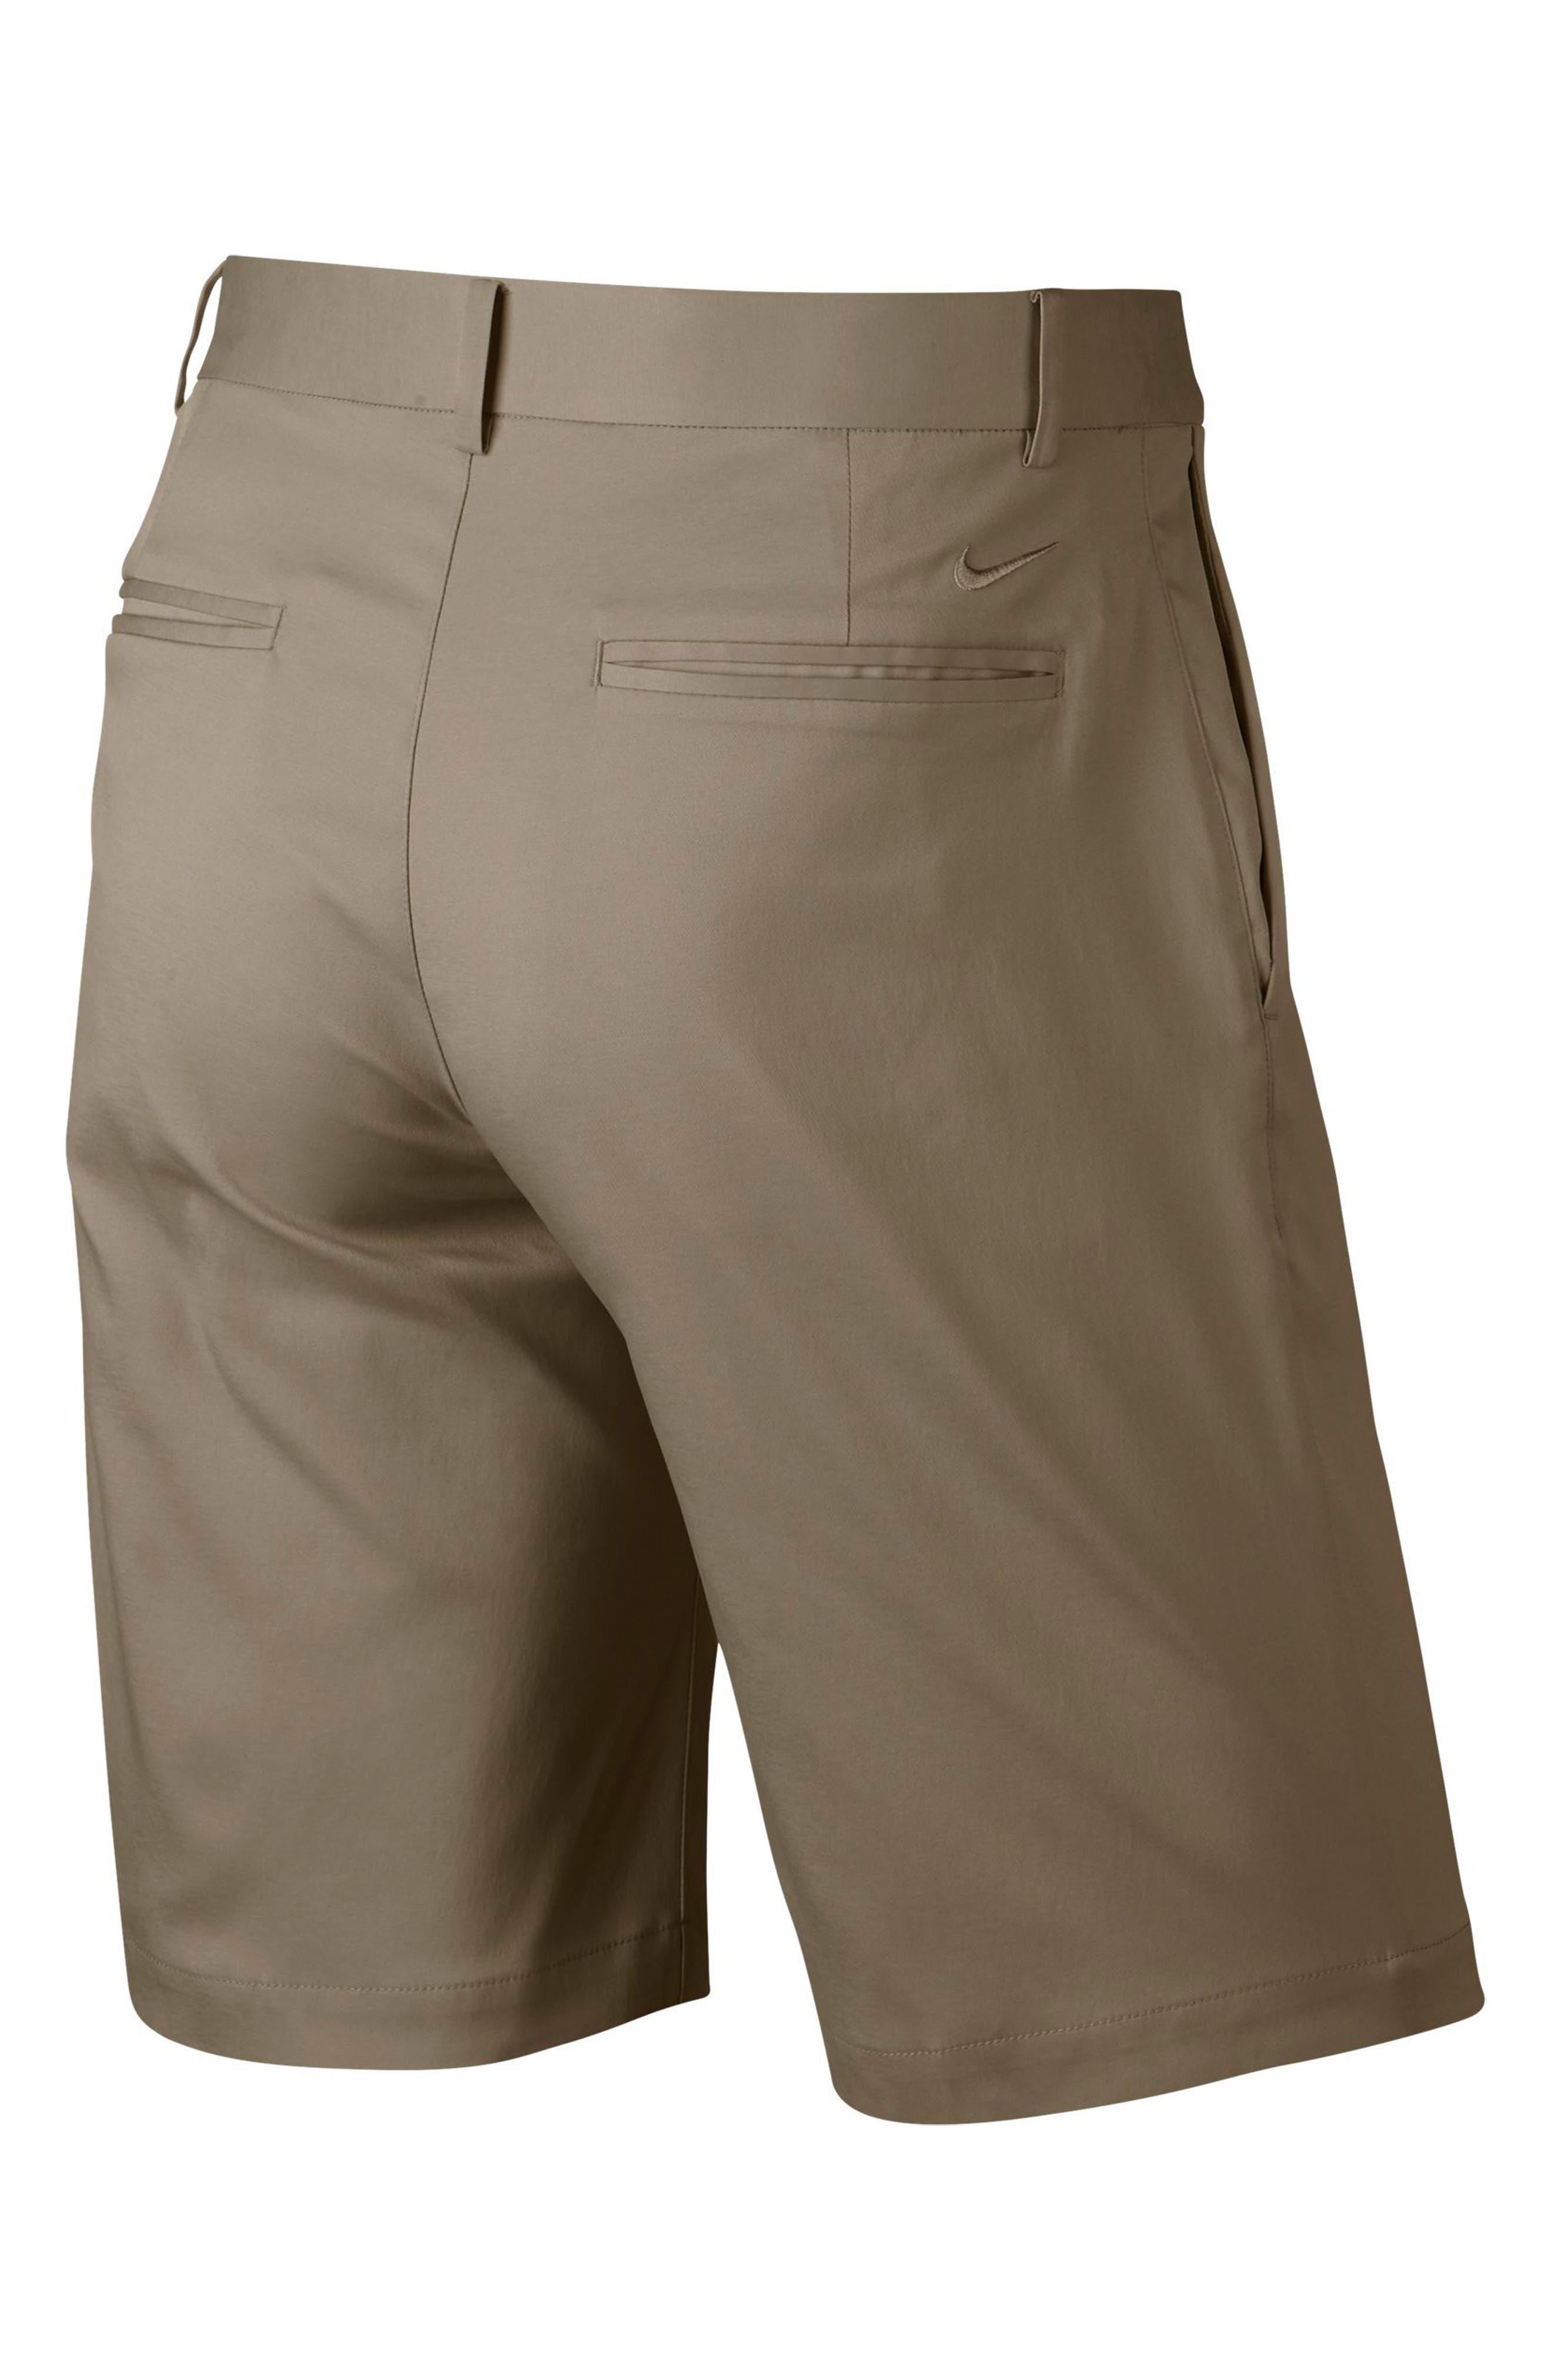 Flat Front Golf Shorts,                             Alternate thumbnail 59, color,